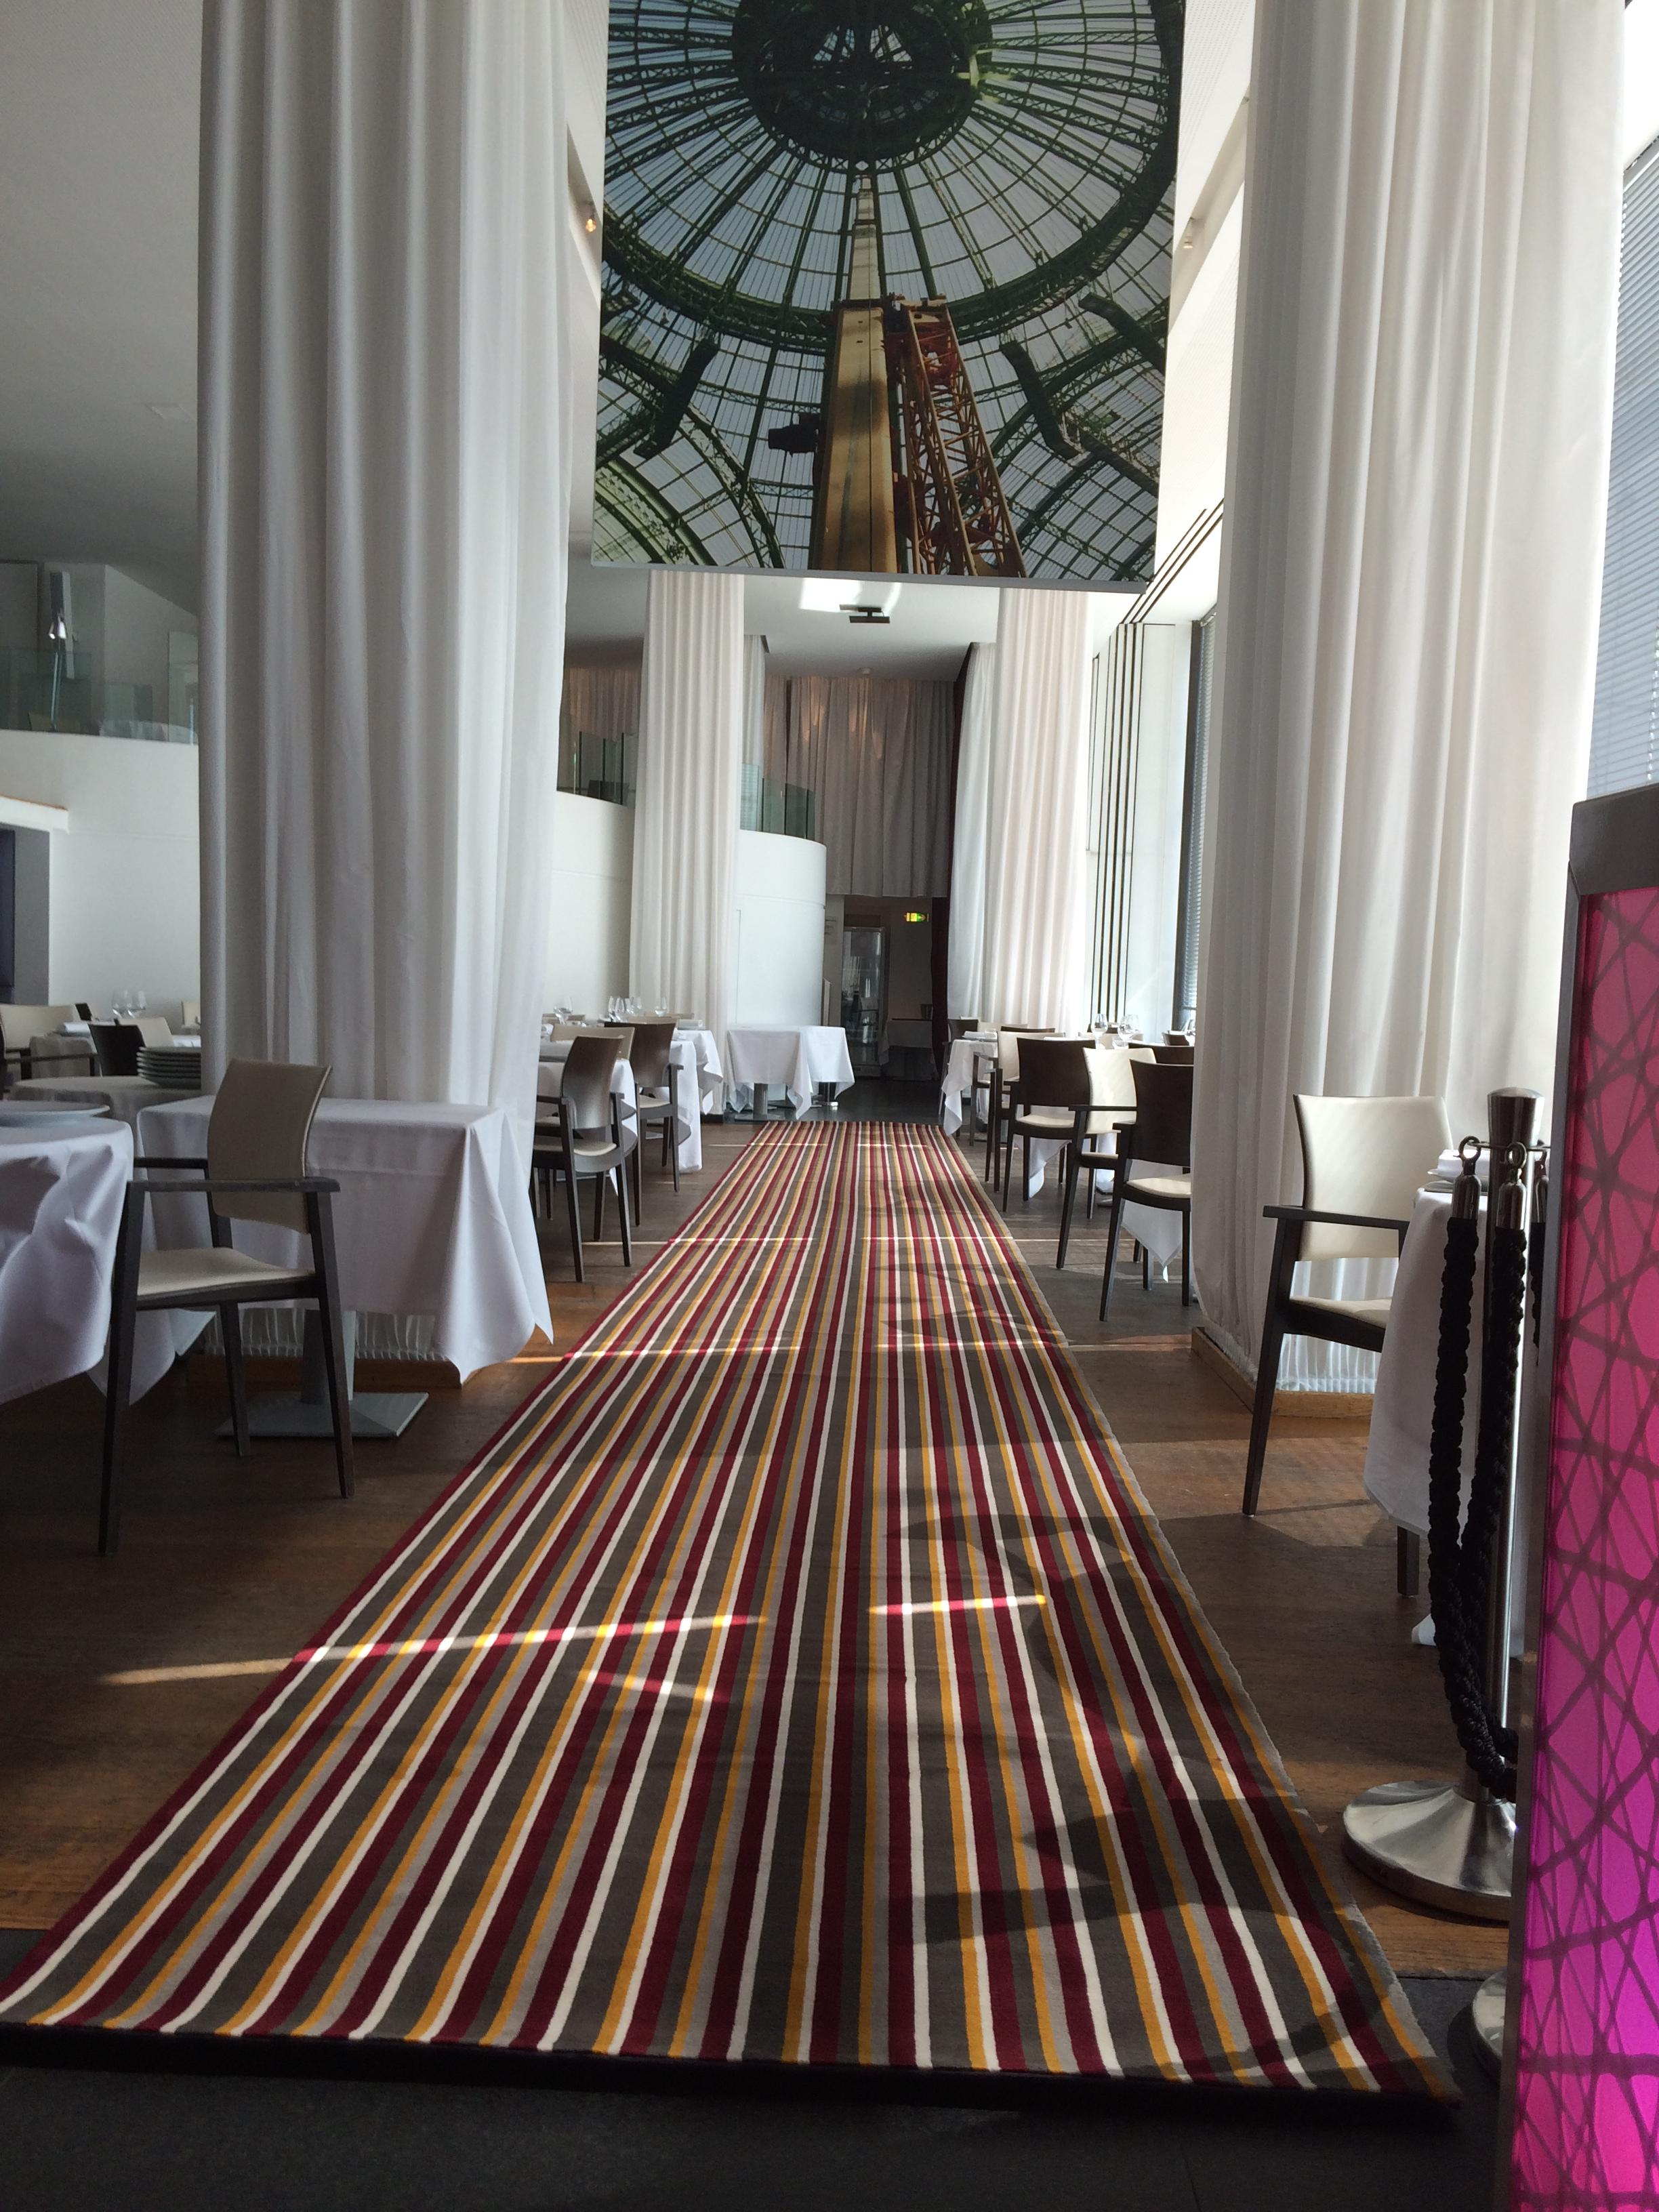 Tapis d immeuble 28 images tapis d immeuble homeezy tapis d entr 233 e 10r tapis pour entr - Tapis hall d immeuble ...